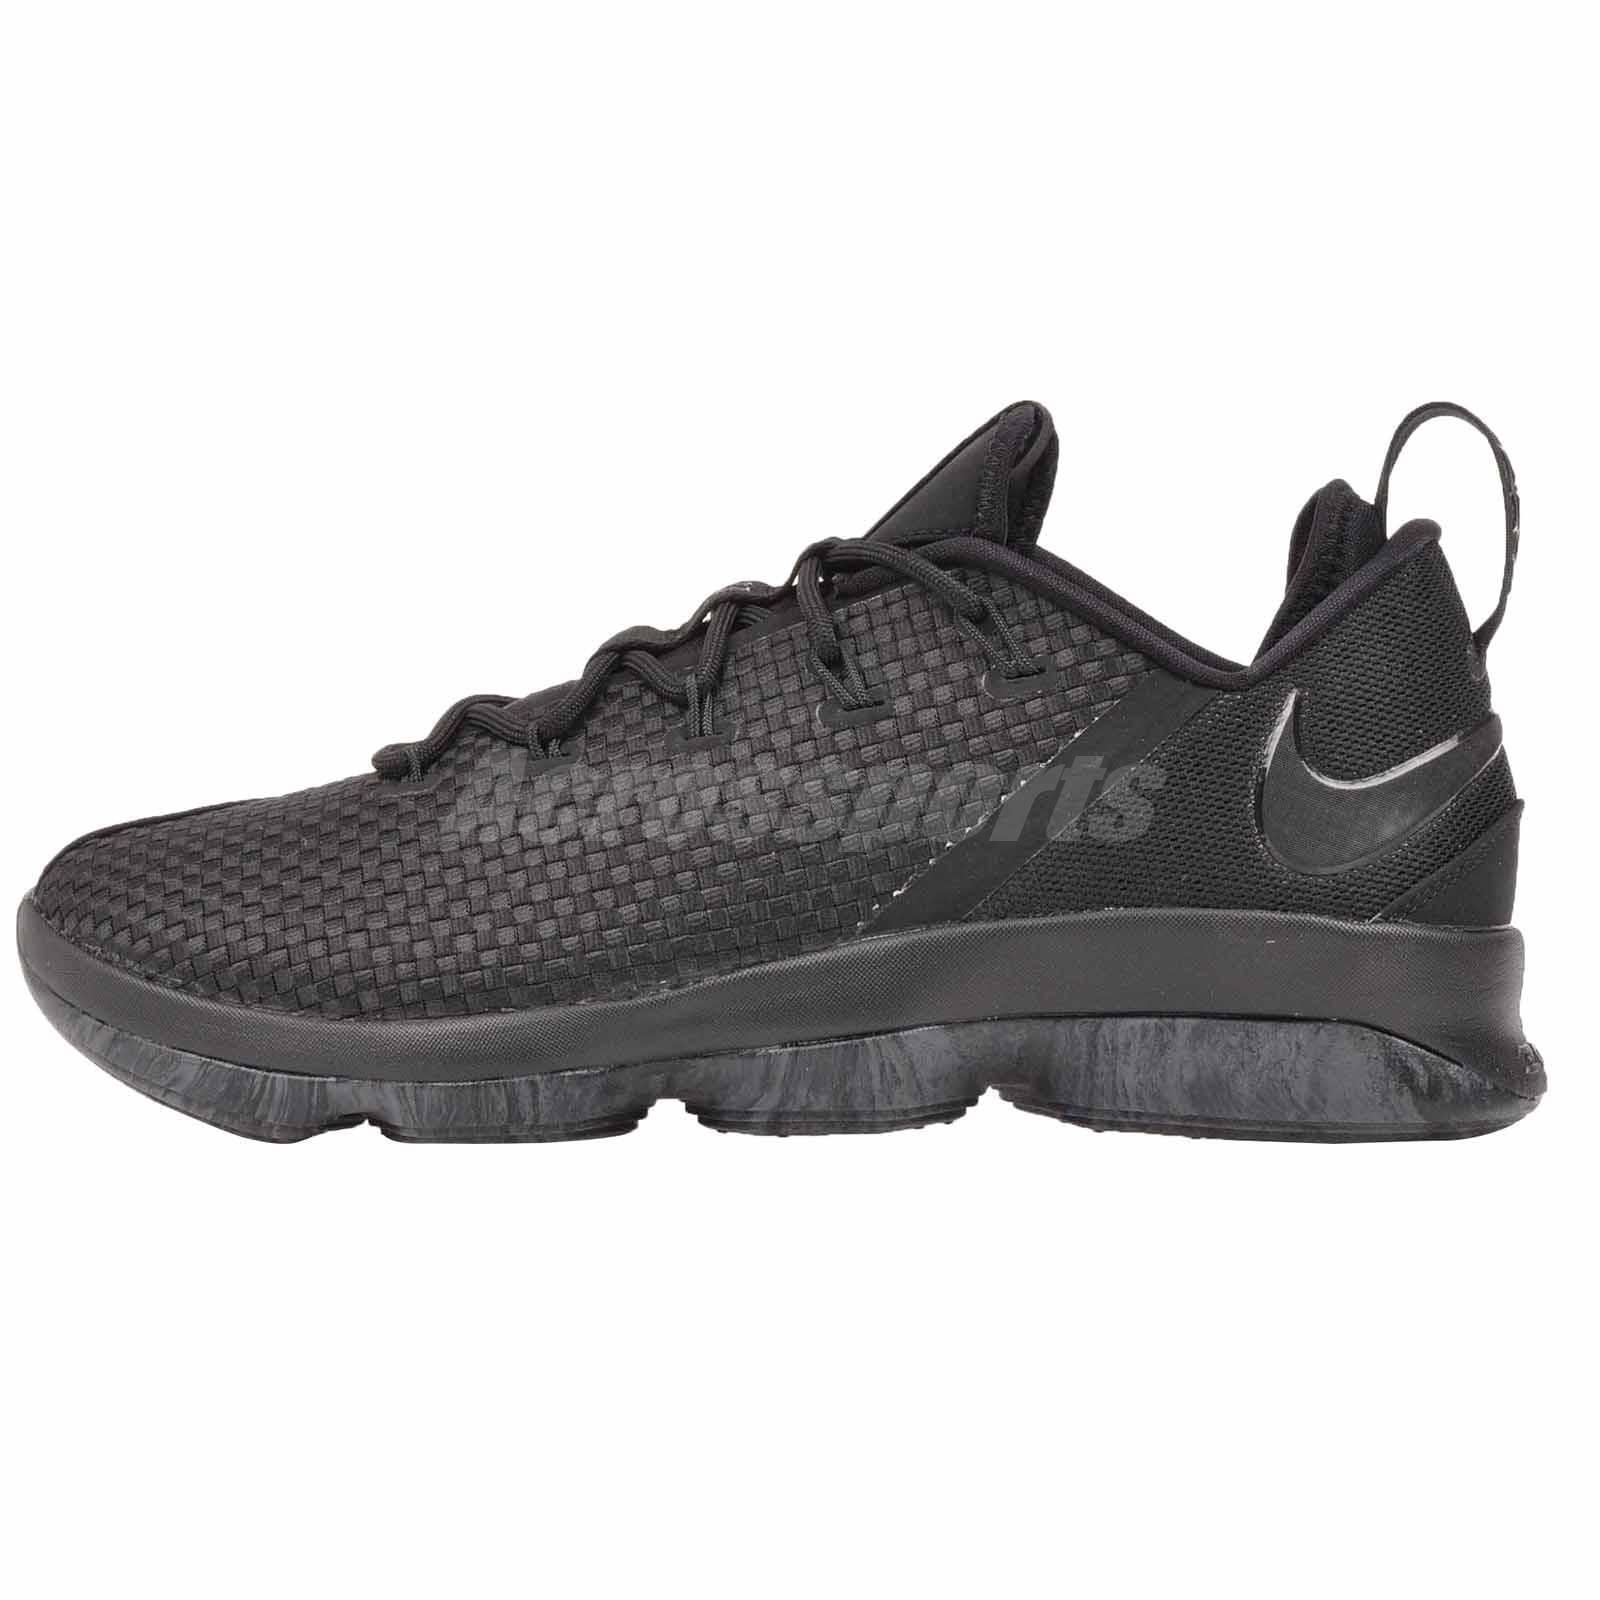 c0cbd2cefdc48 Mens Nike Lebron XIV 14 Low Basketball Shoes Size 12 Black Dark Grey ...